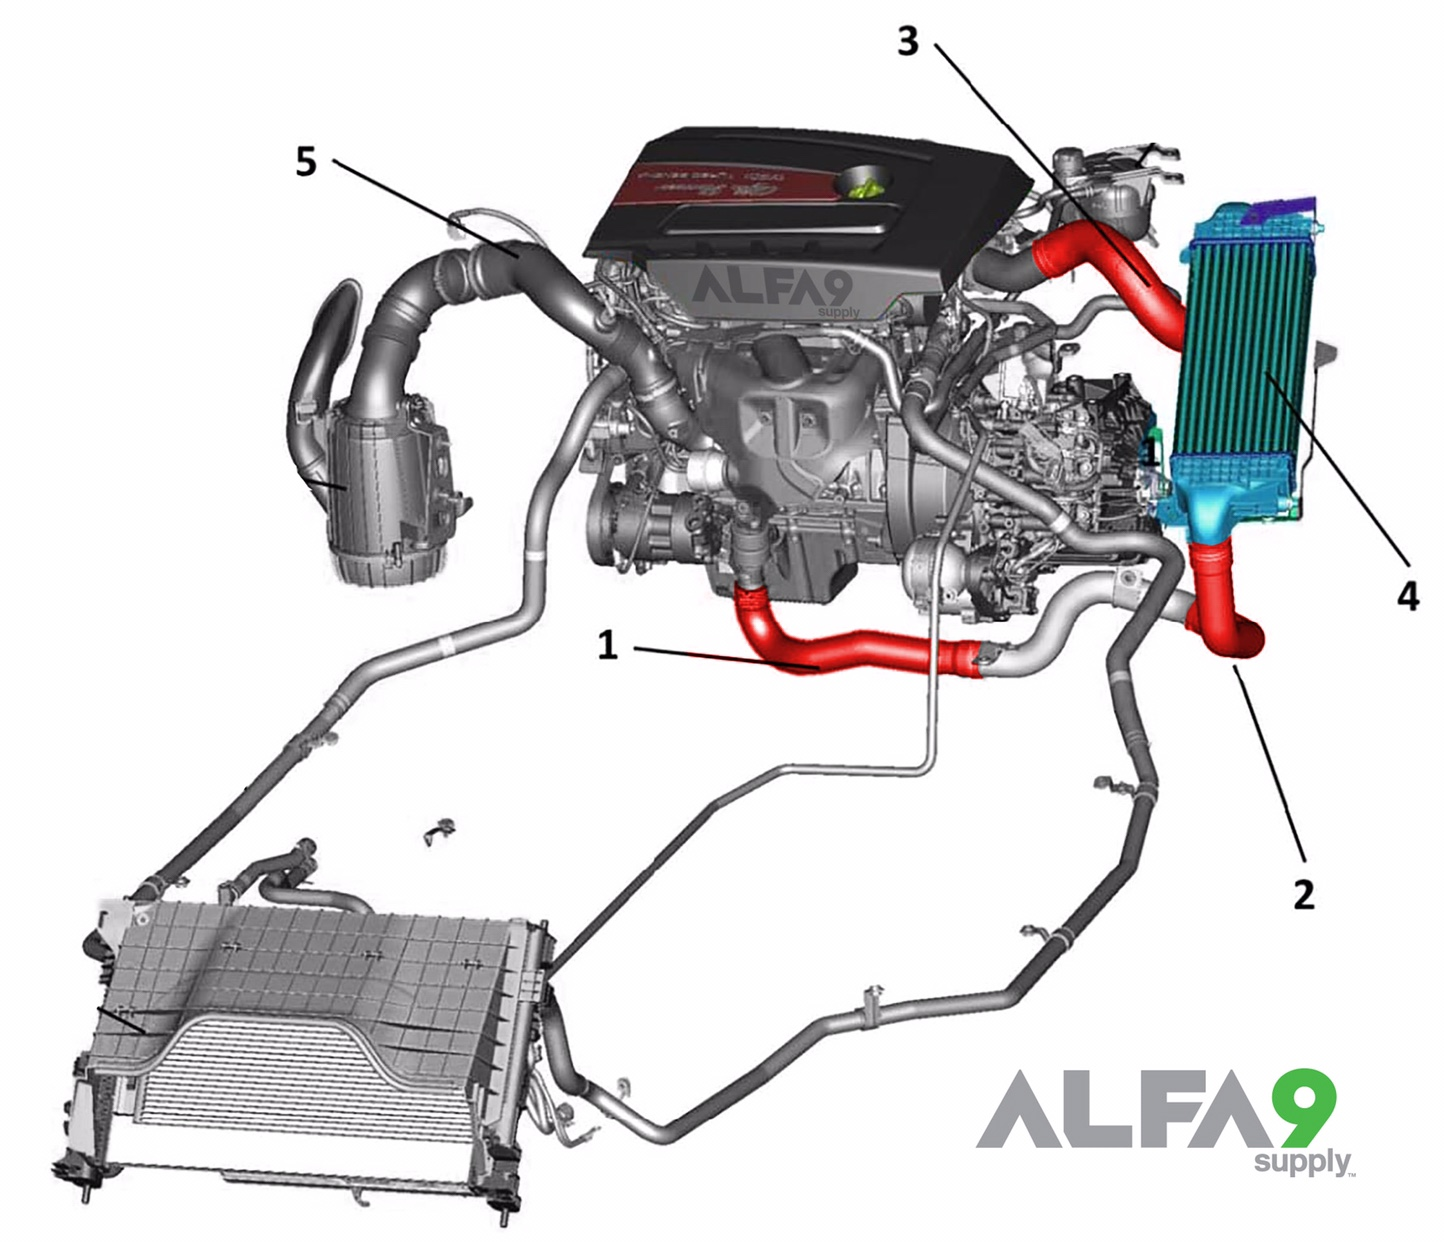 hight resolution of stock intercooler hoses not strong enough alfa romeo 4c forums alfa romeo 4c bonnet alfa romeo 4c engine diagram